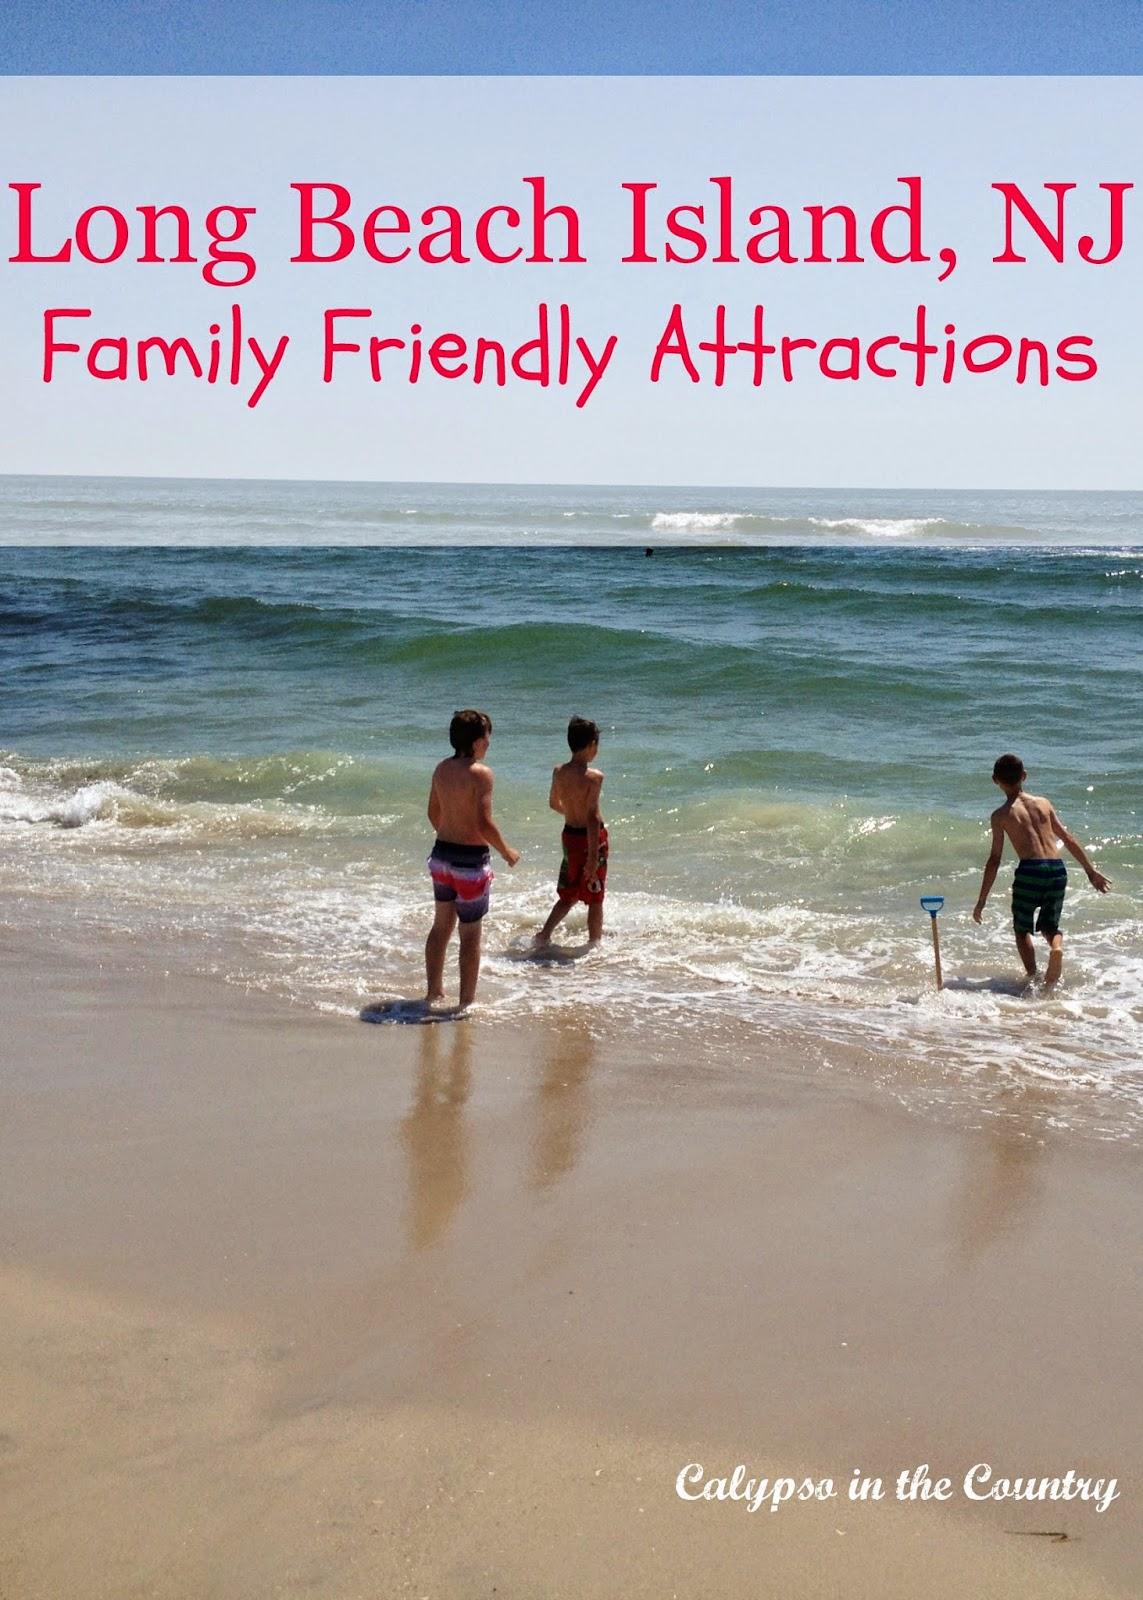 Long Beach Island Attractions